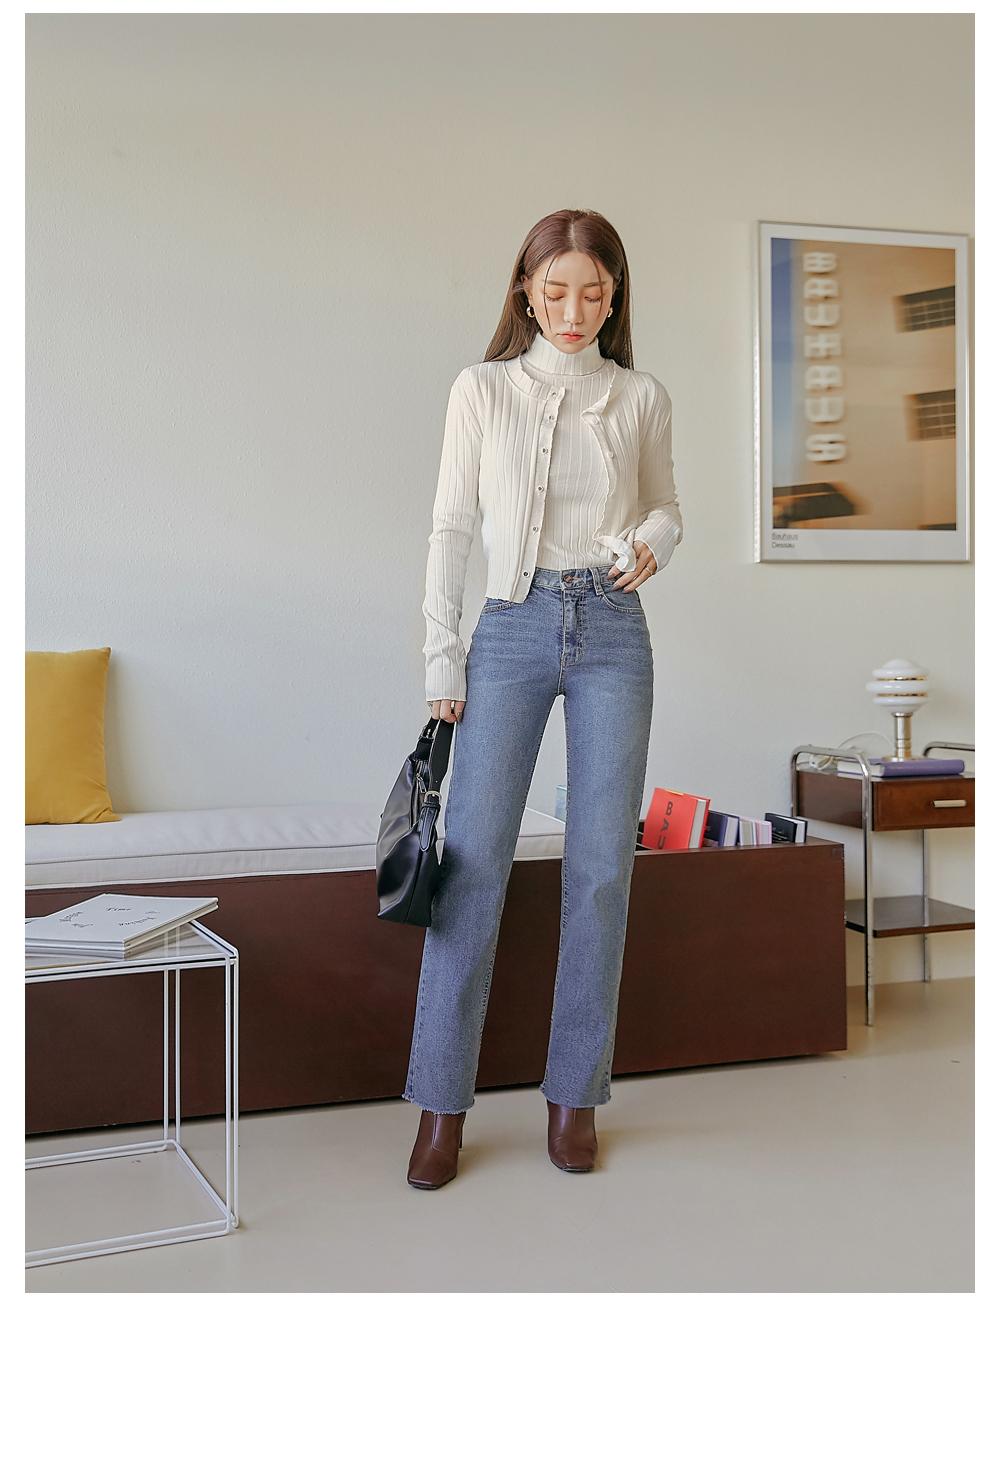 dress model image-S1L39